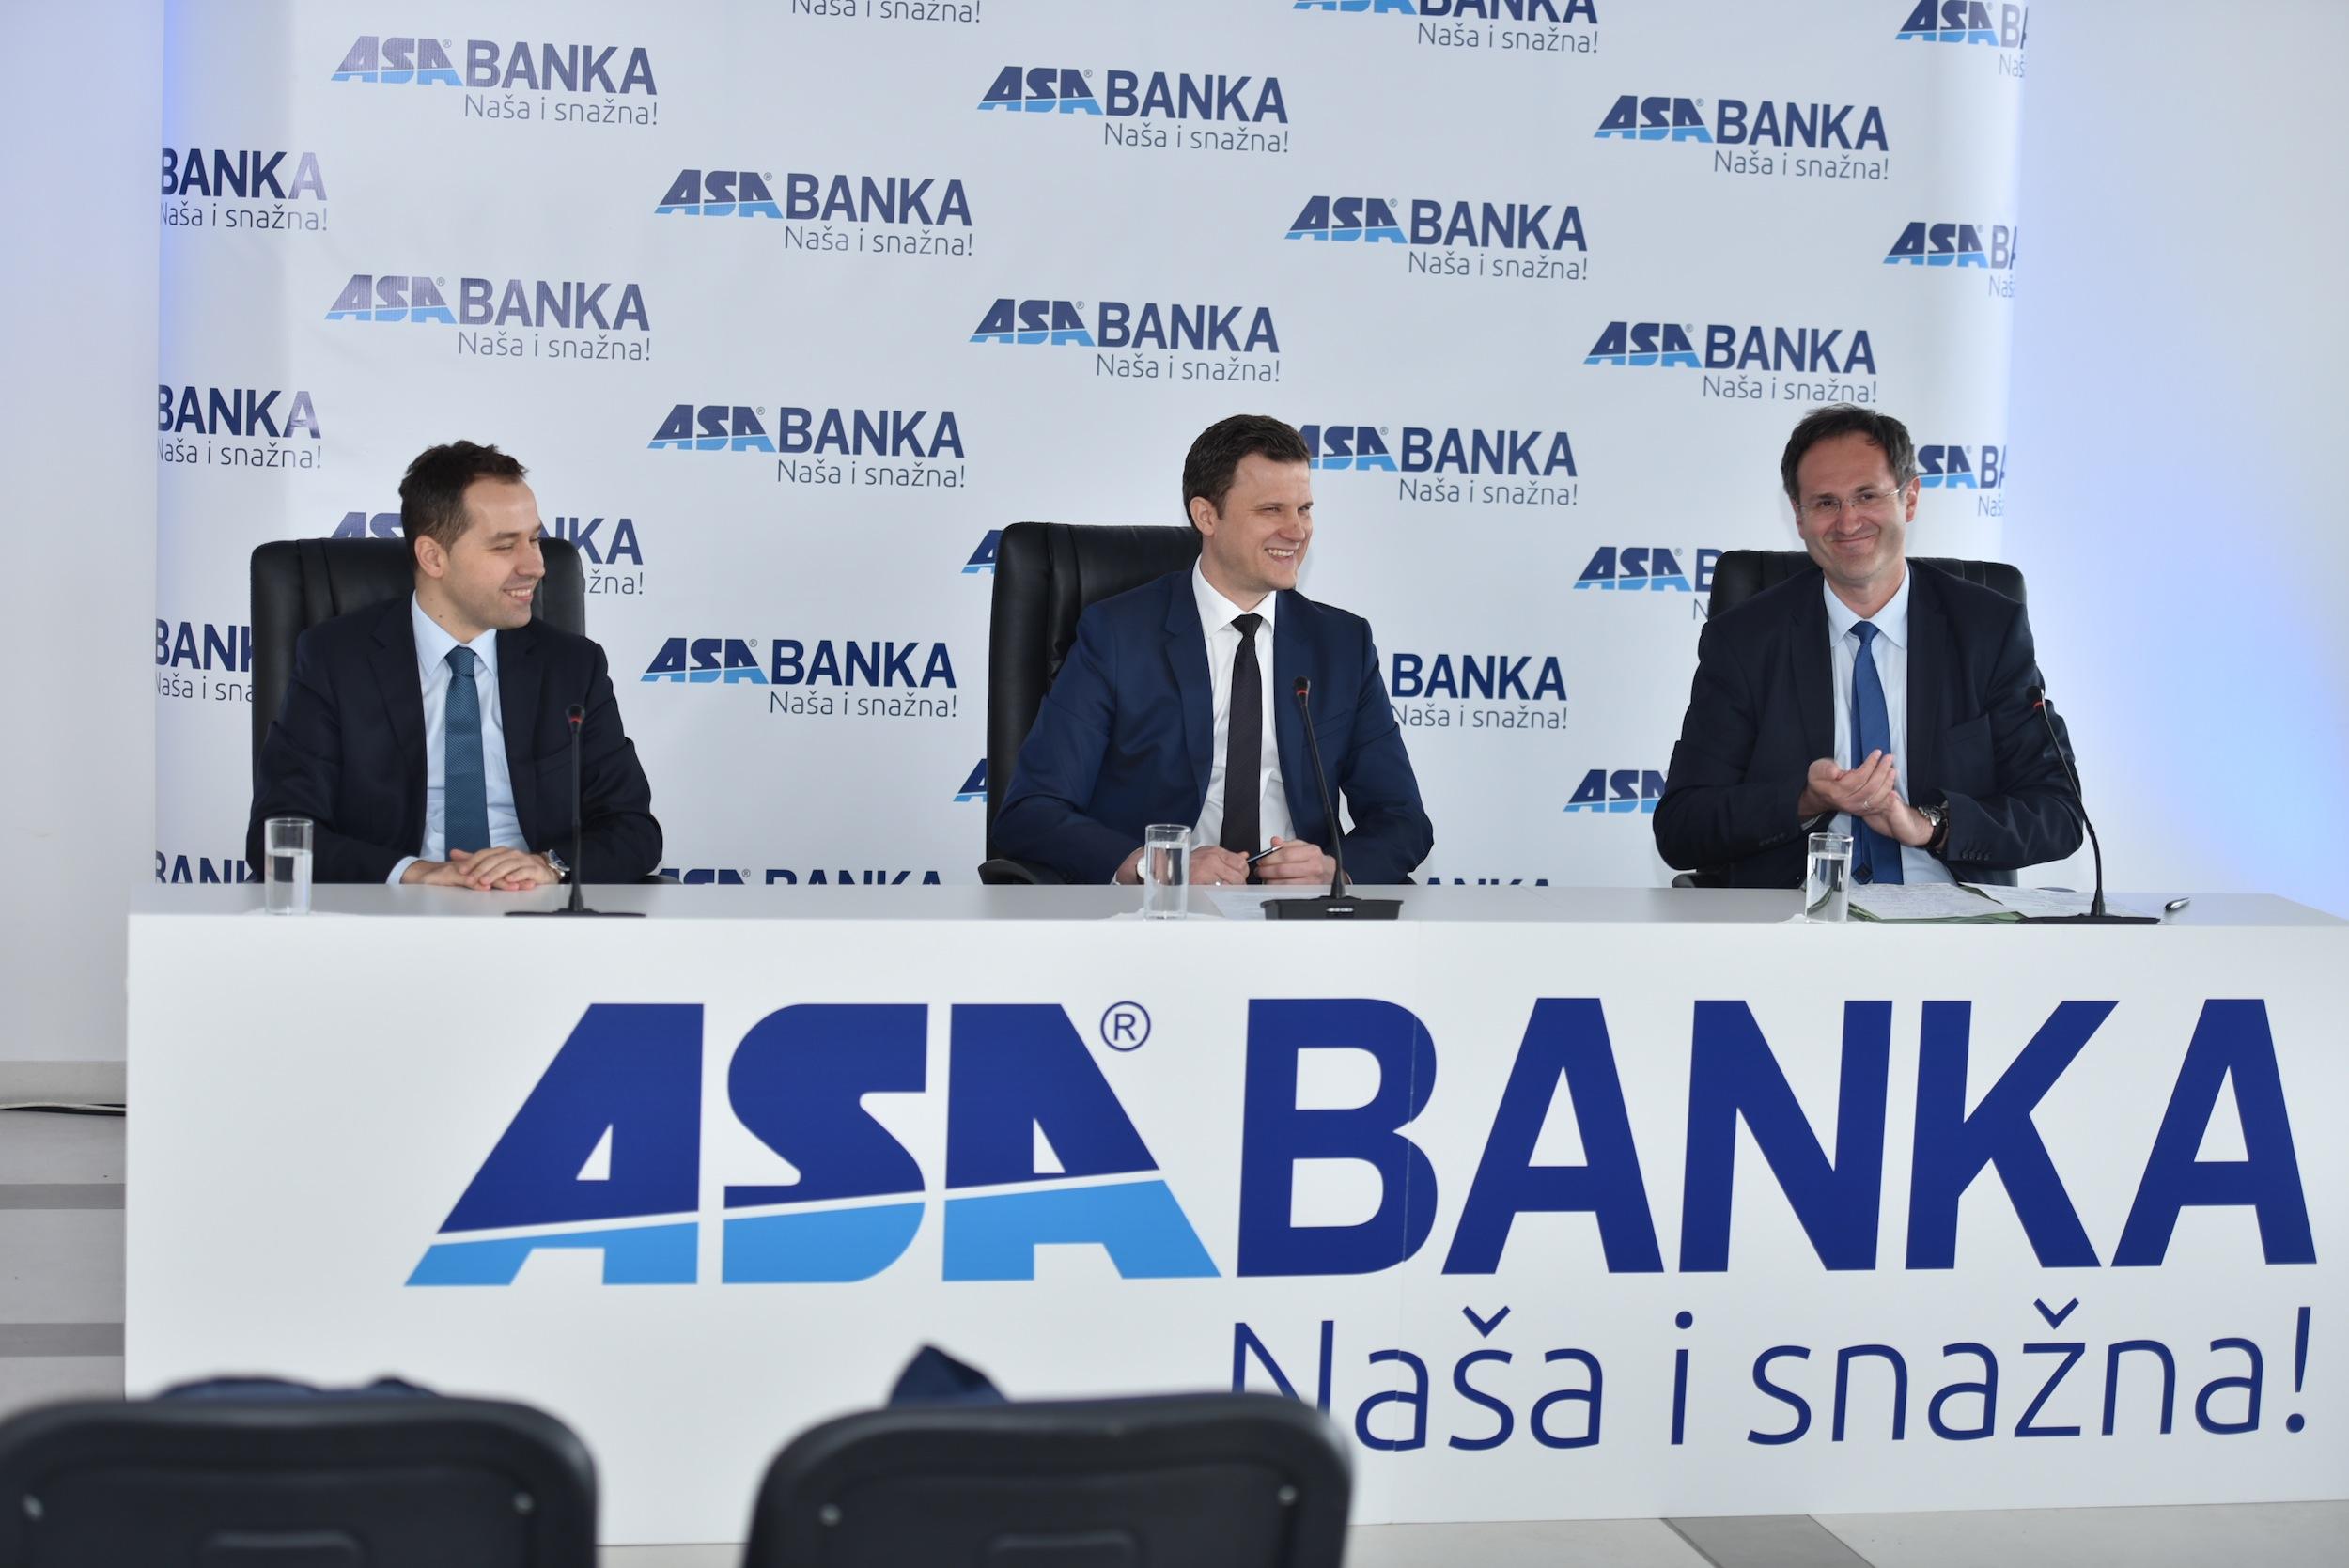 ASA_BANKA